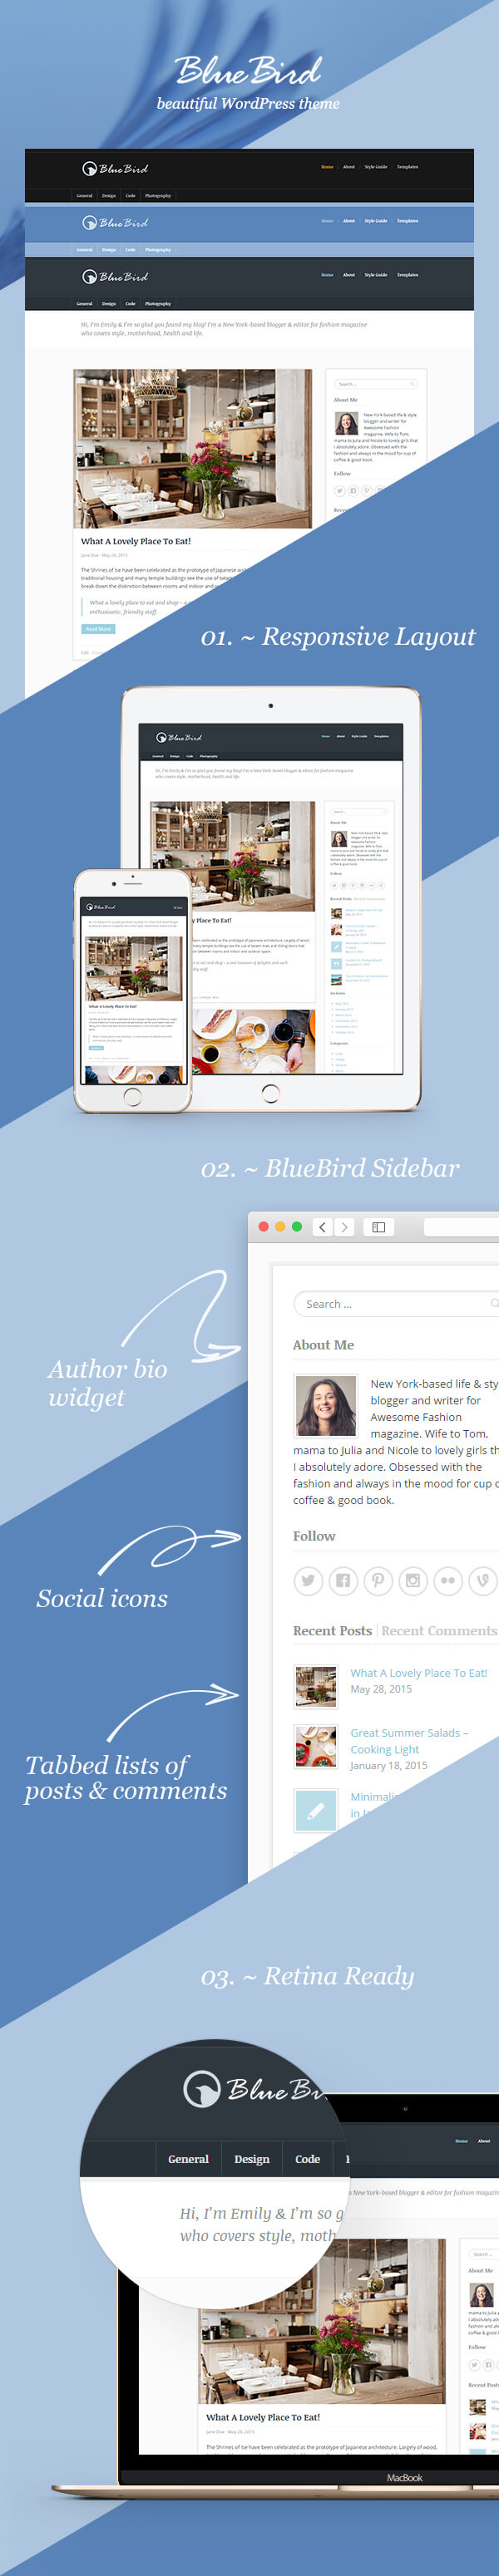 BlueBird Presentation